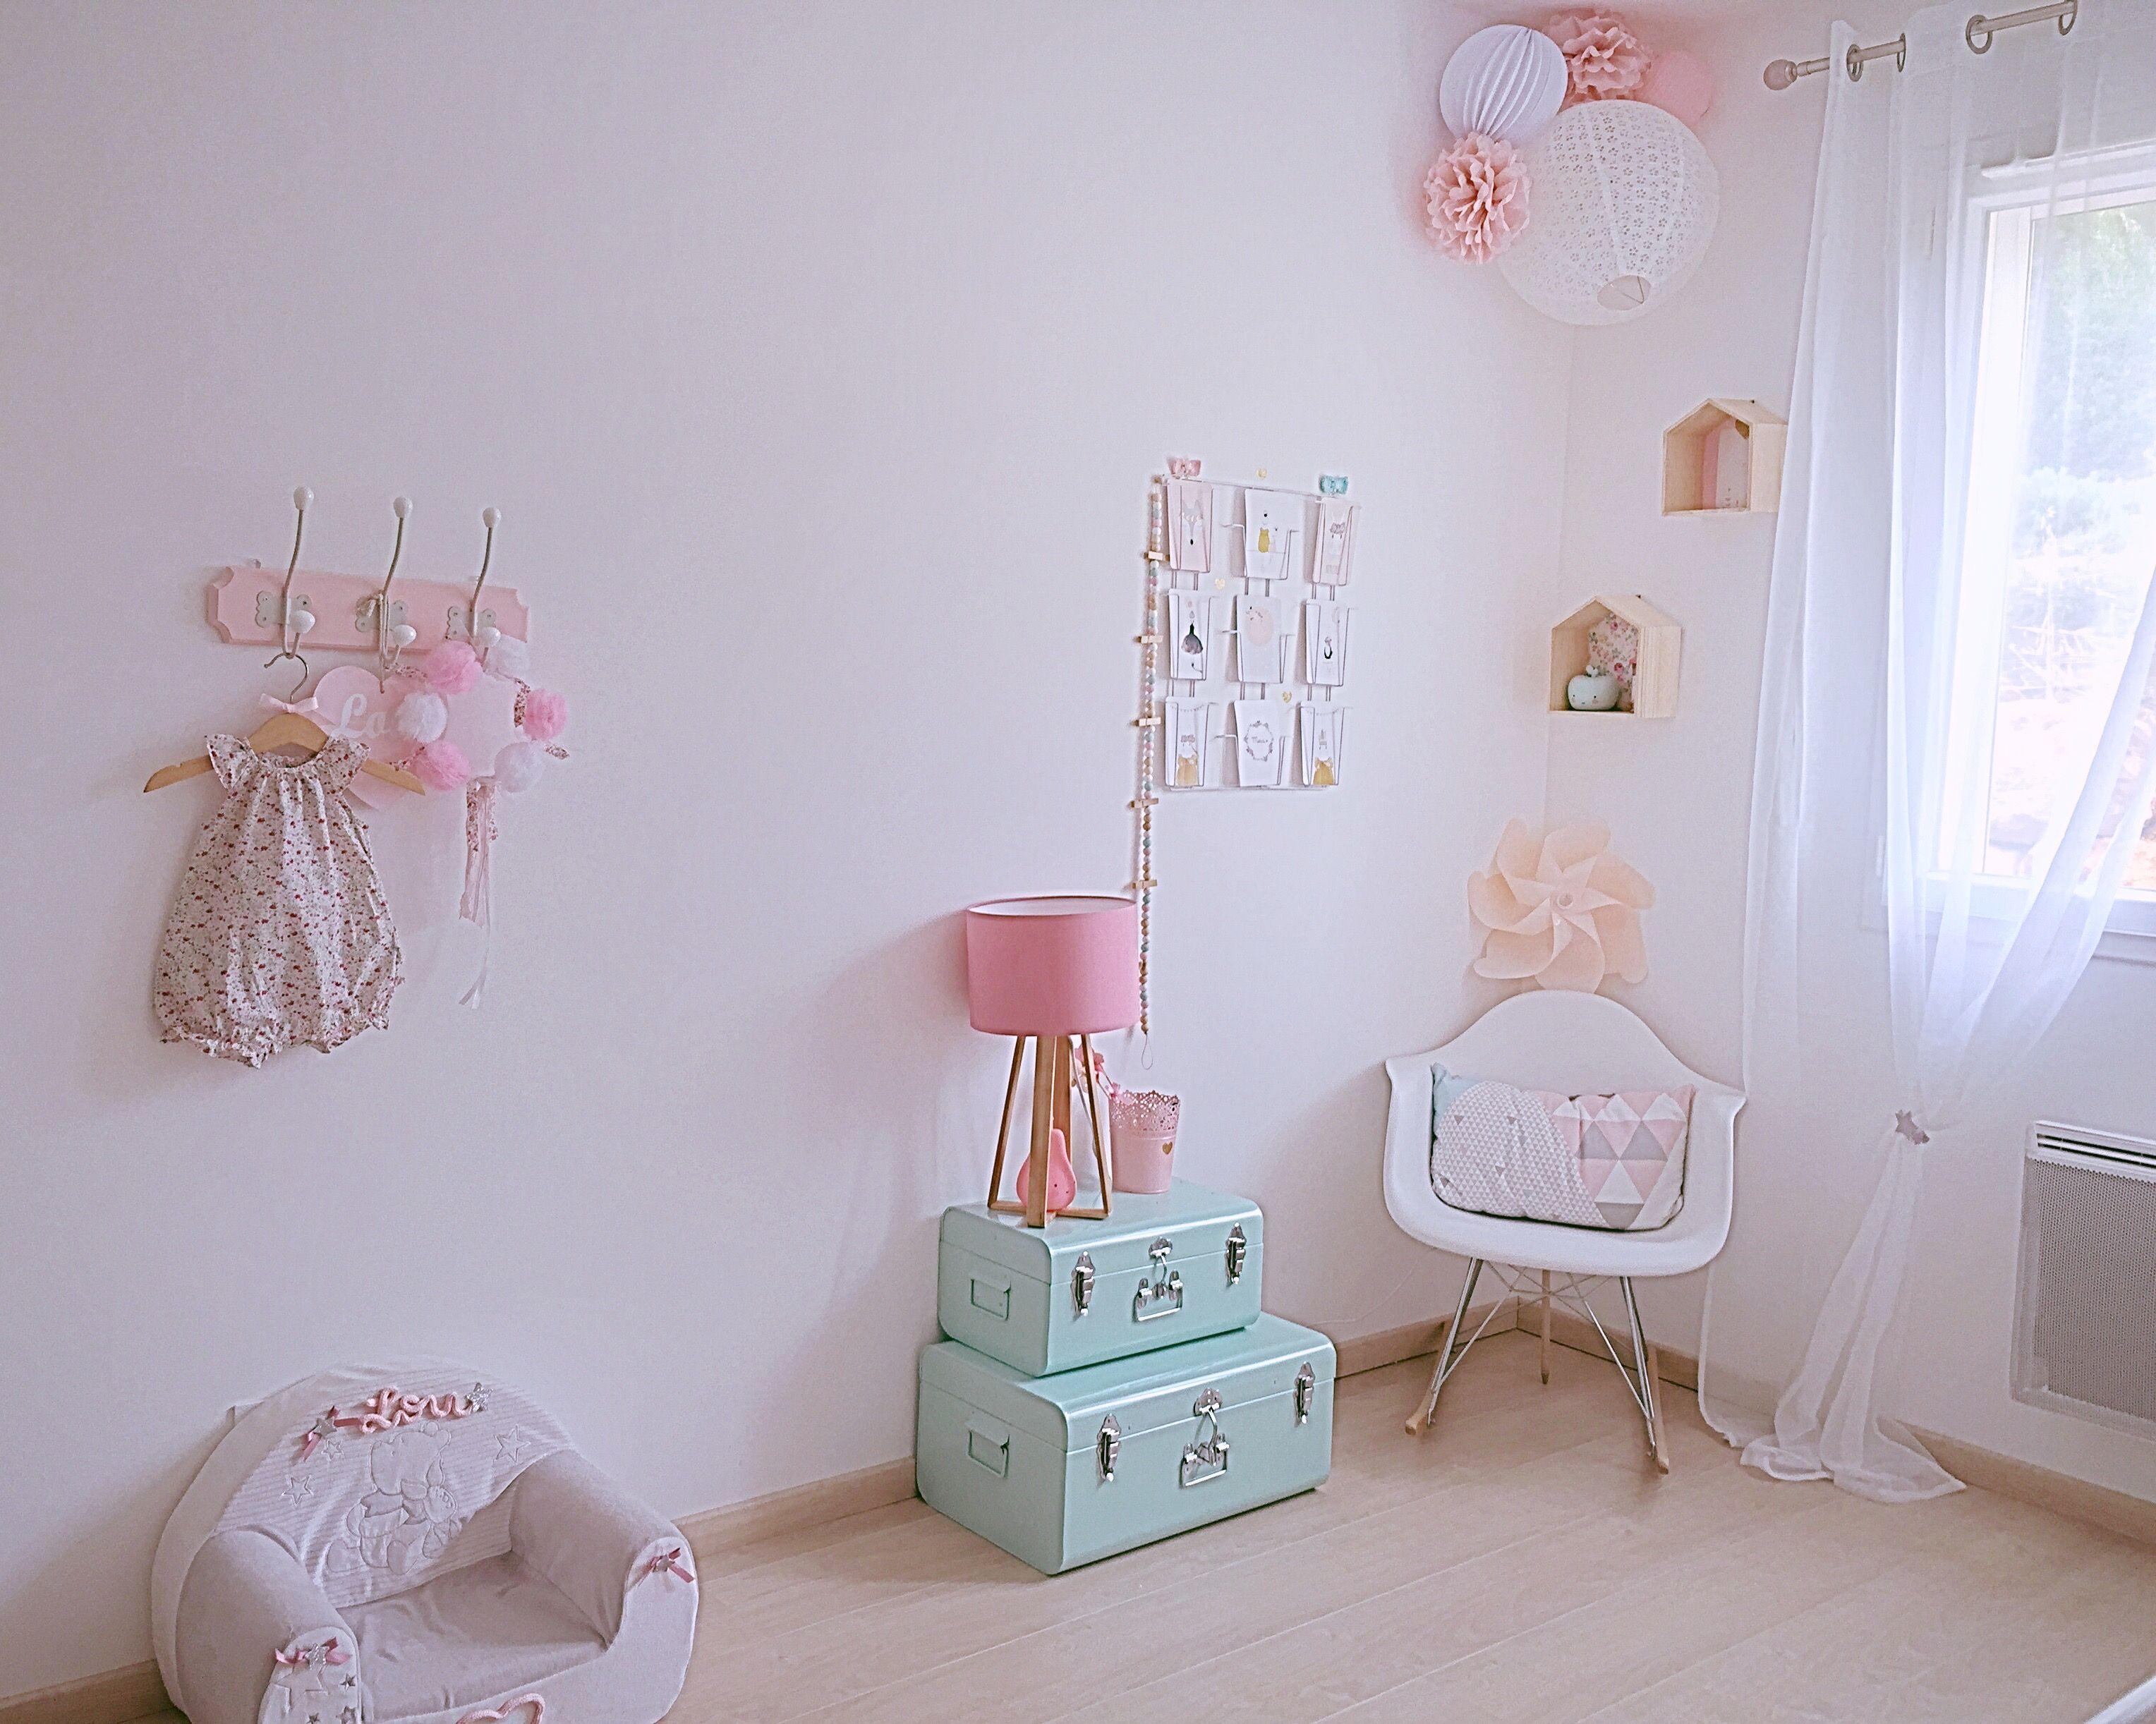 Stunning dcouvrez la chambre pastel de lou sur chambrebebe - Deco chambre pastel ...